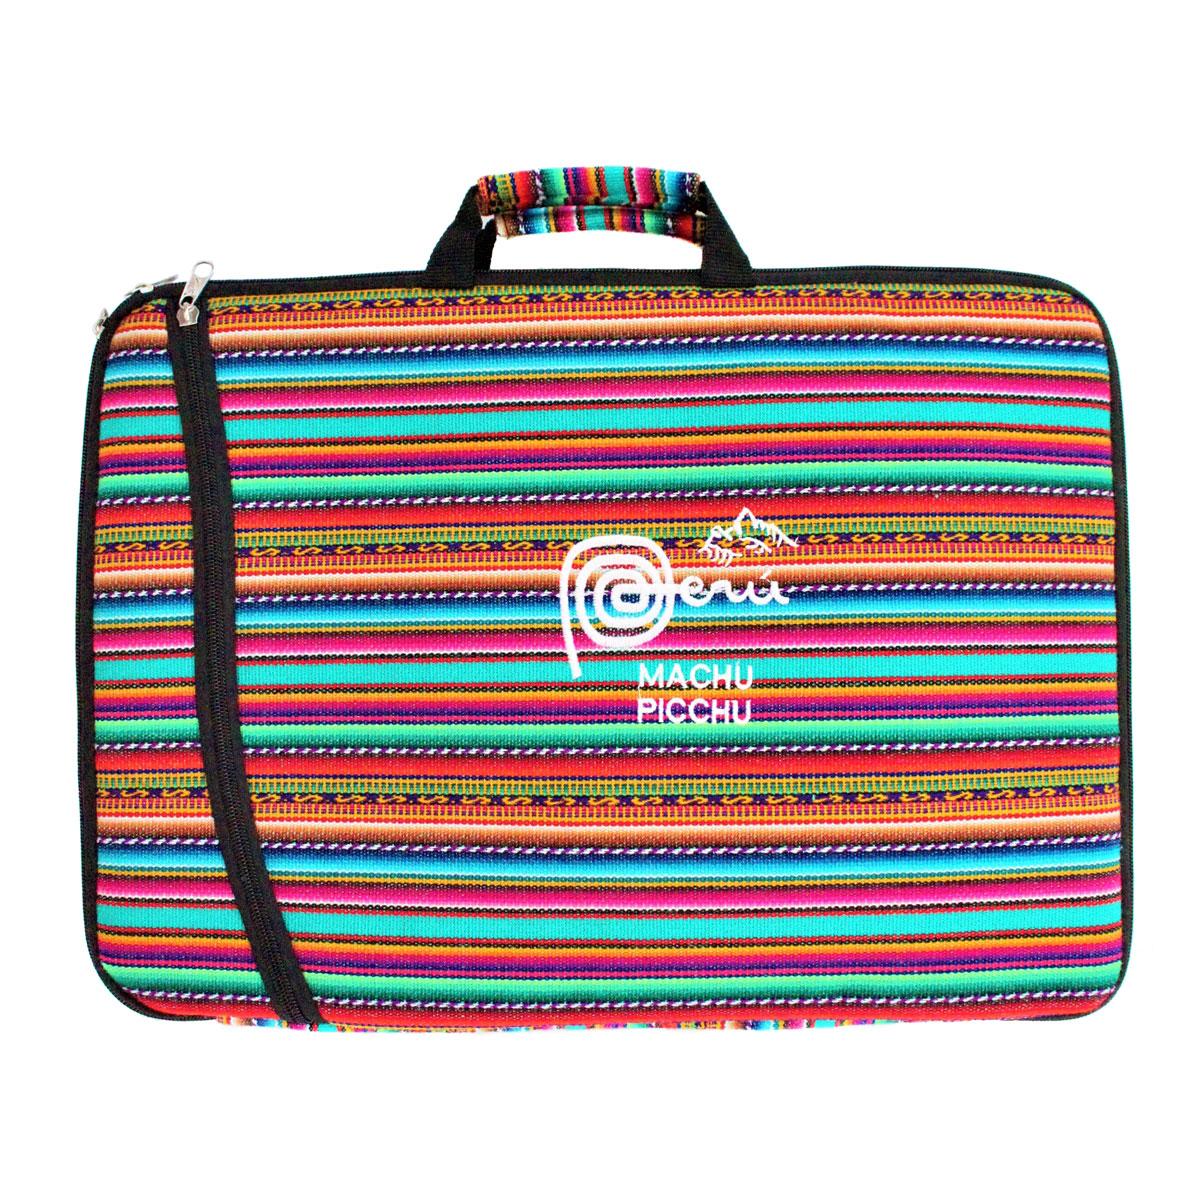 Inka-Products-Housse Ordinateur Portable-Tissu Péruvien Machu Picchu